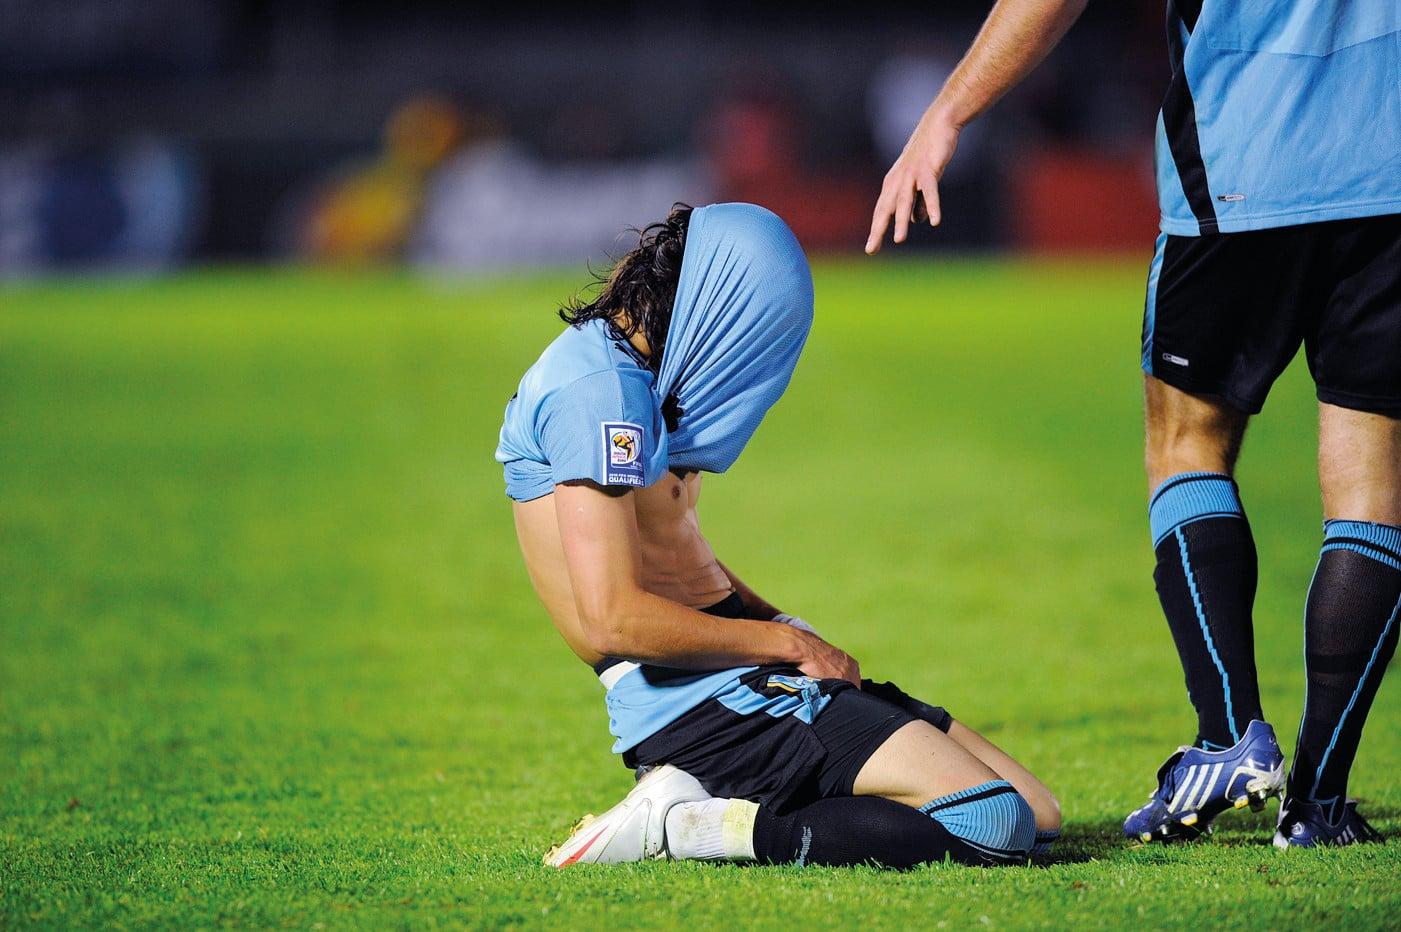 аргентина уругвай прогноз на матч